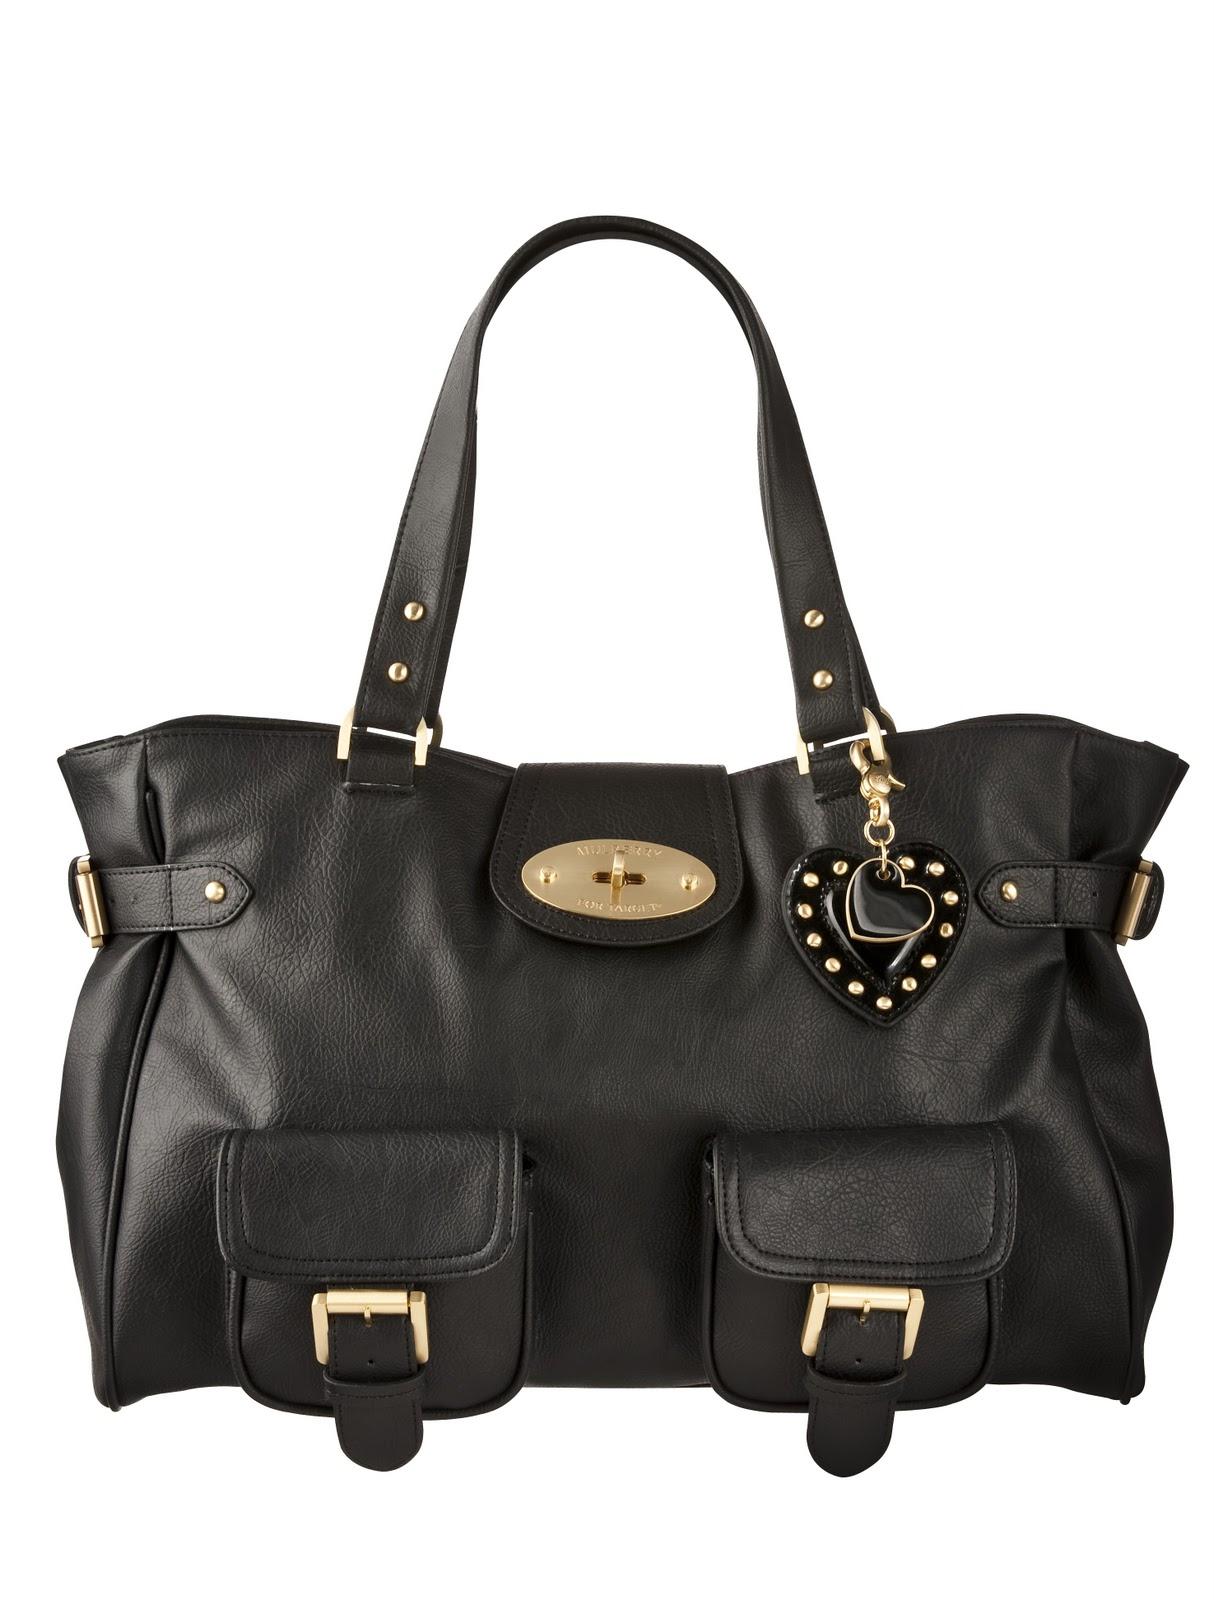 http://3.bp.blogspot.com/_tHQ1gA2brsc/TK-lyi-bBdI/AAAAAAAAGX0/7F4CTt73IZg/s1600/Mulberry+for+Target+Look+02.jpg